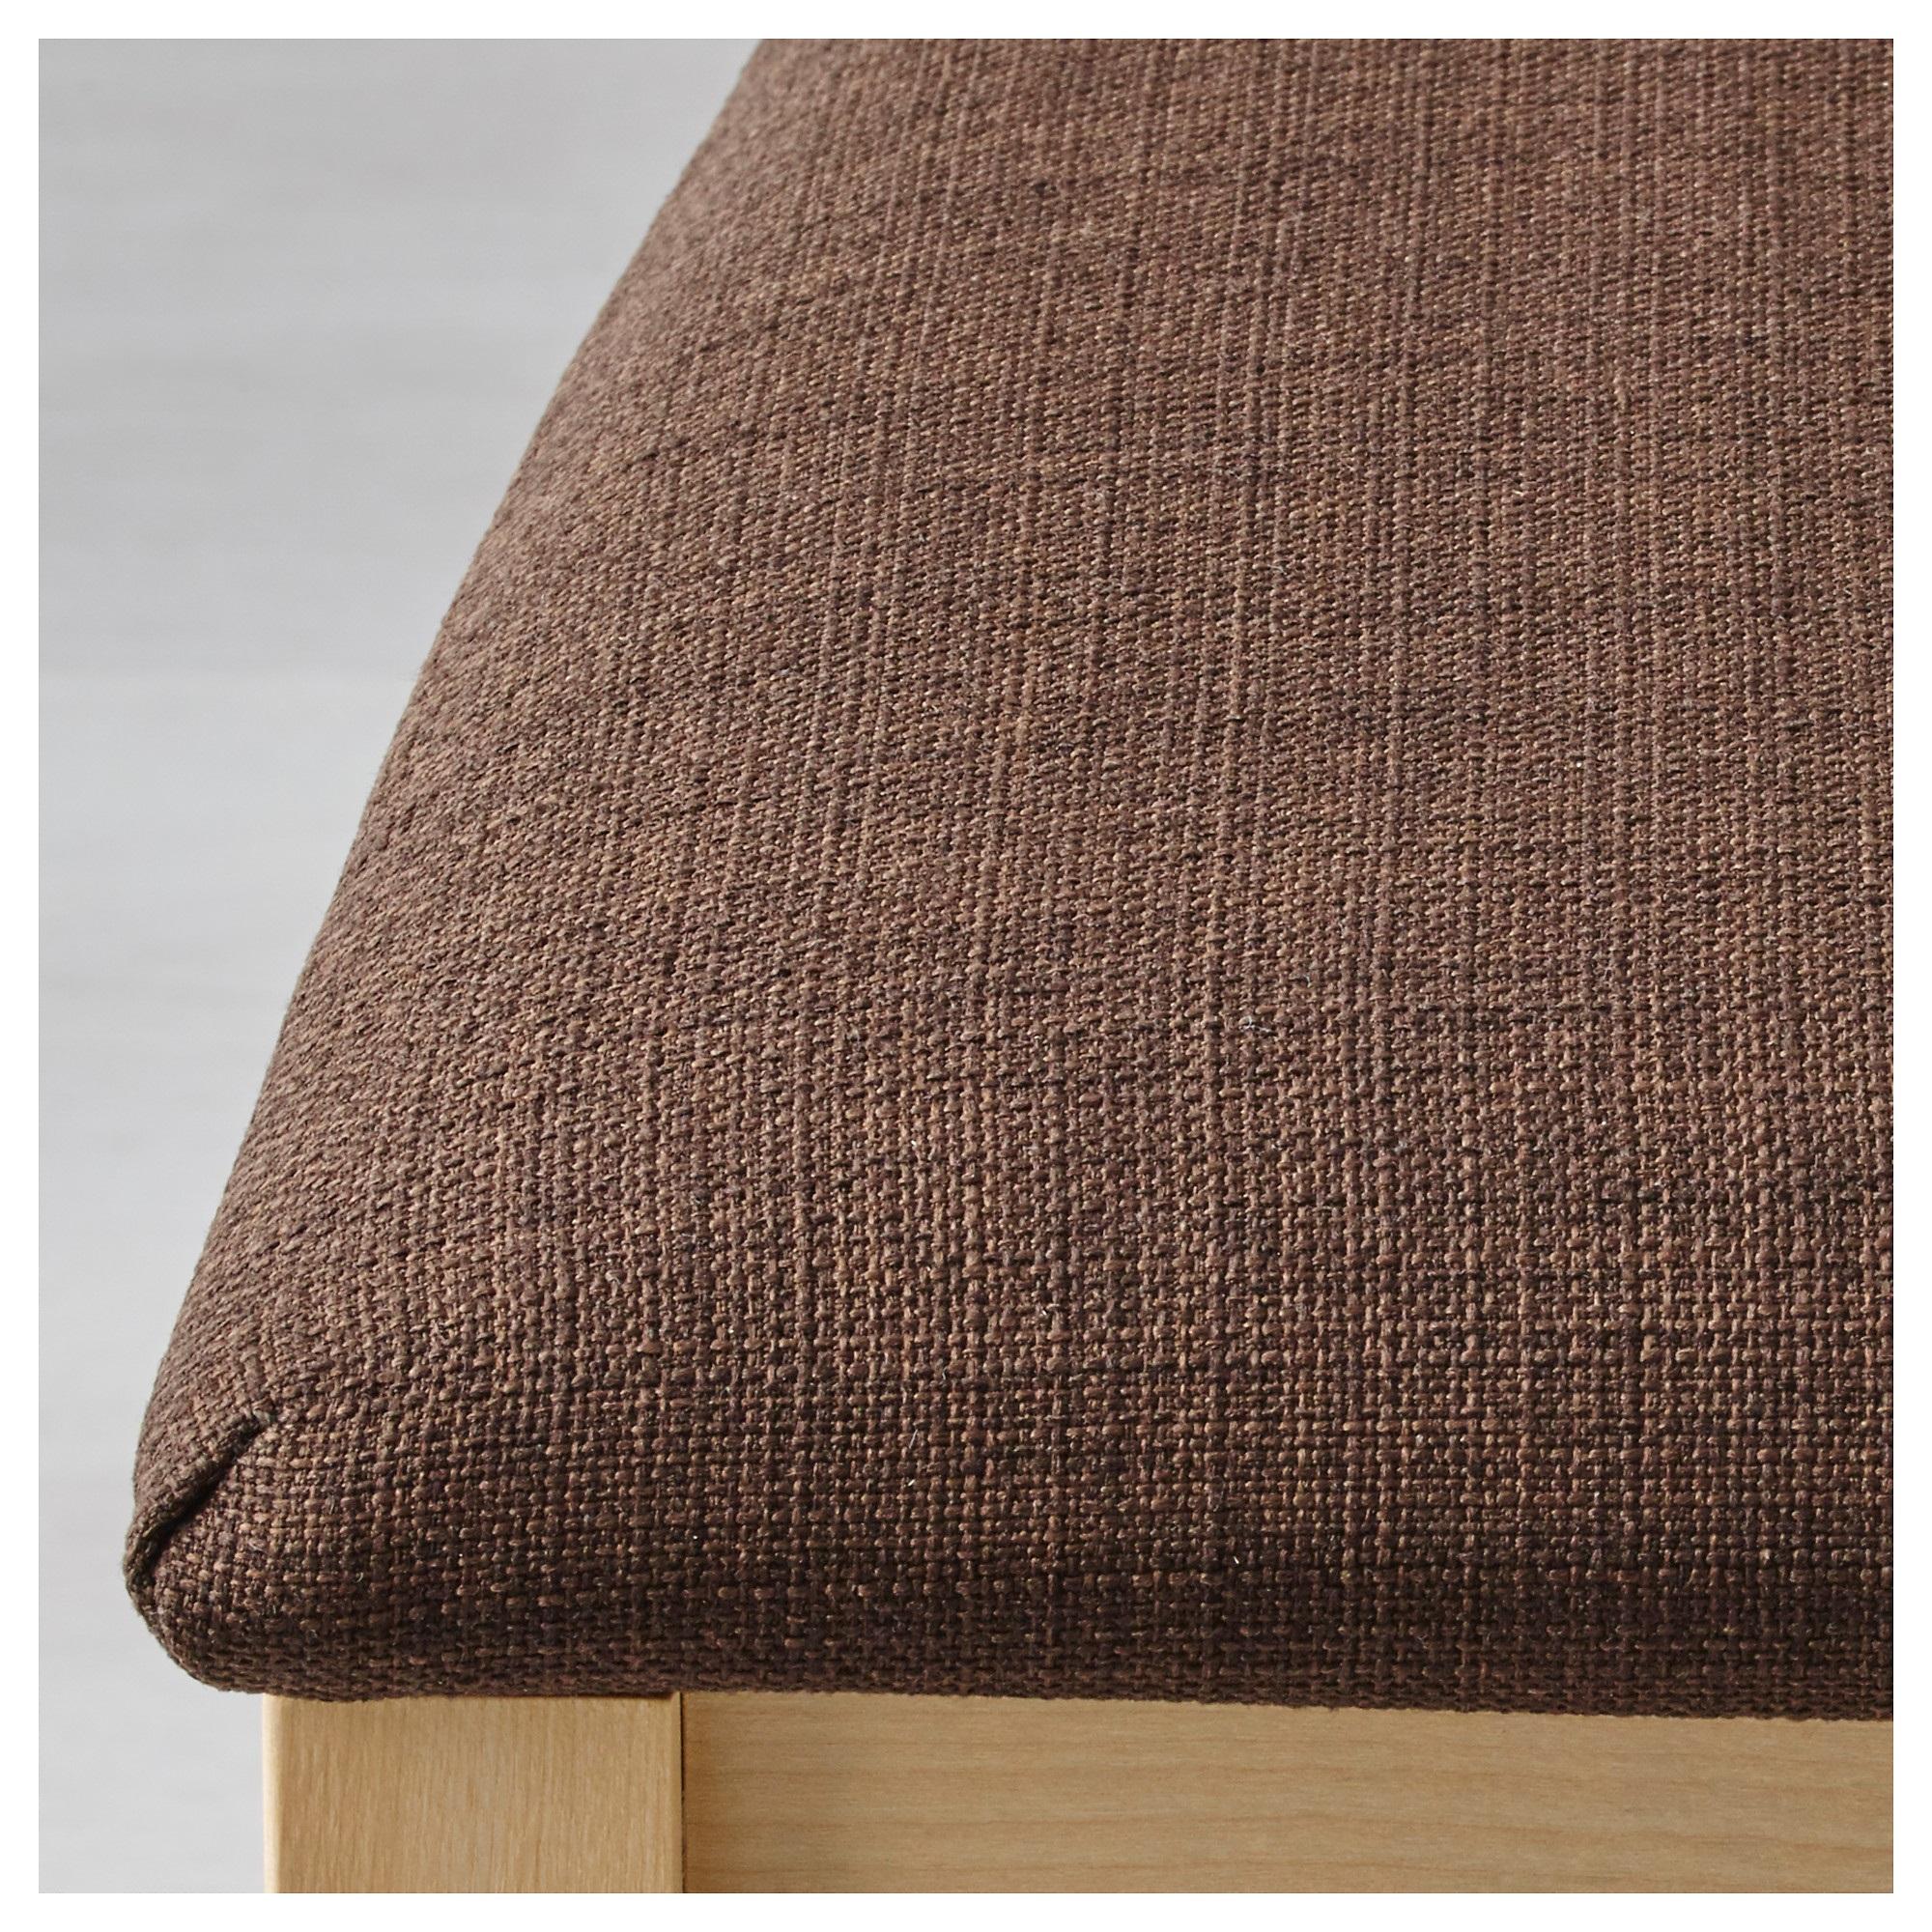 чехол на стул материал